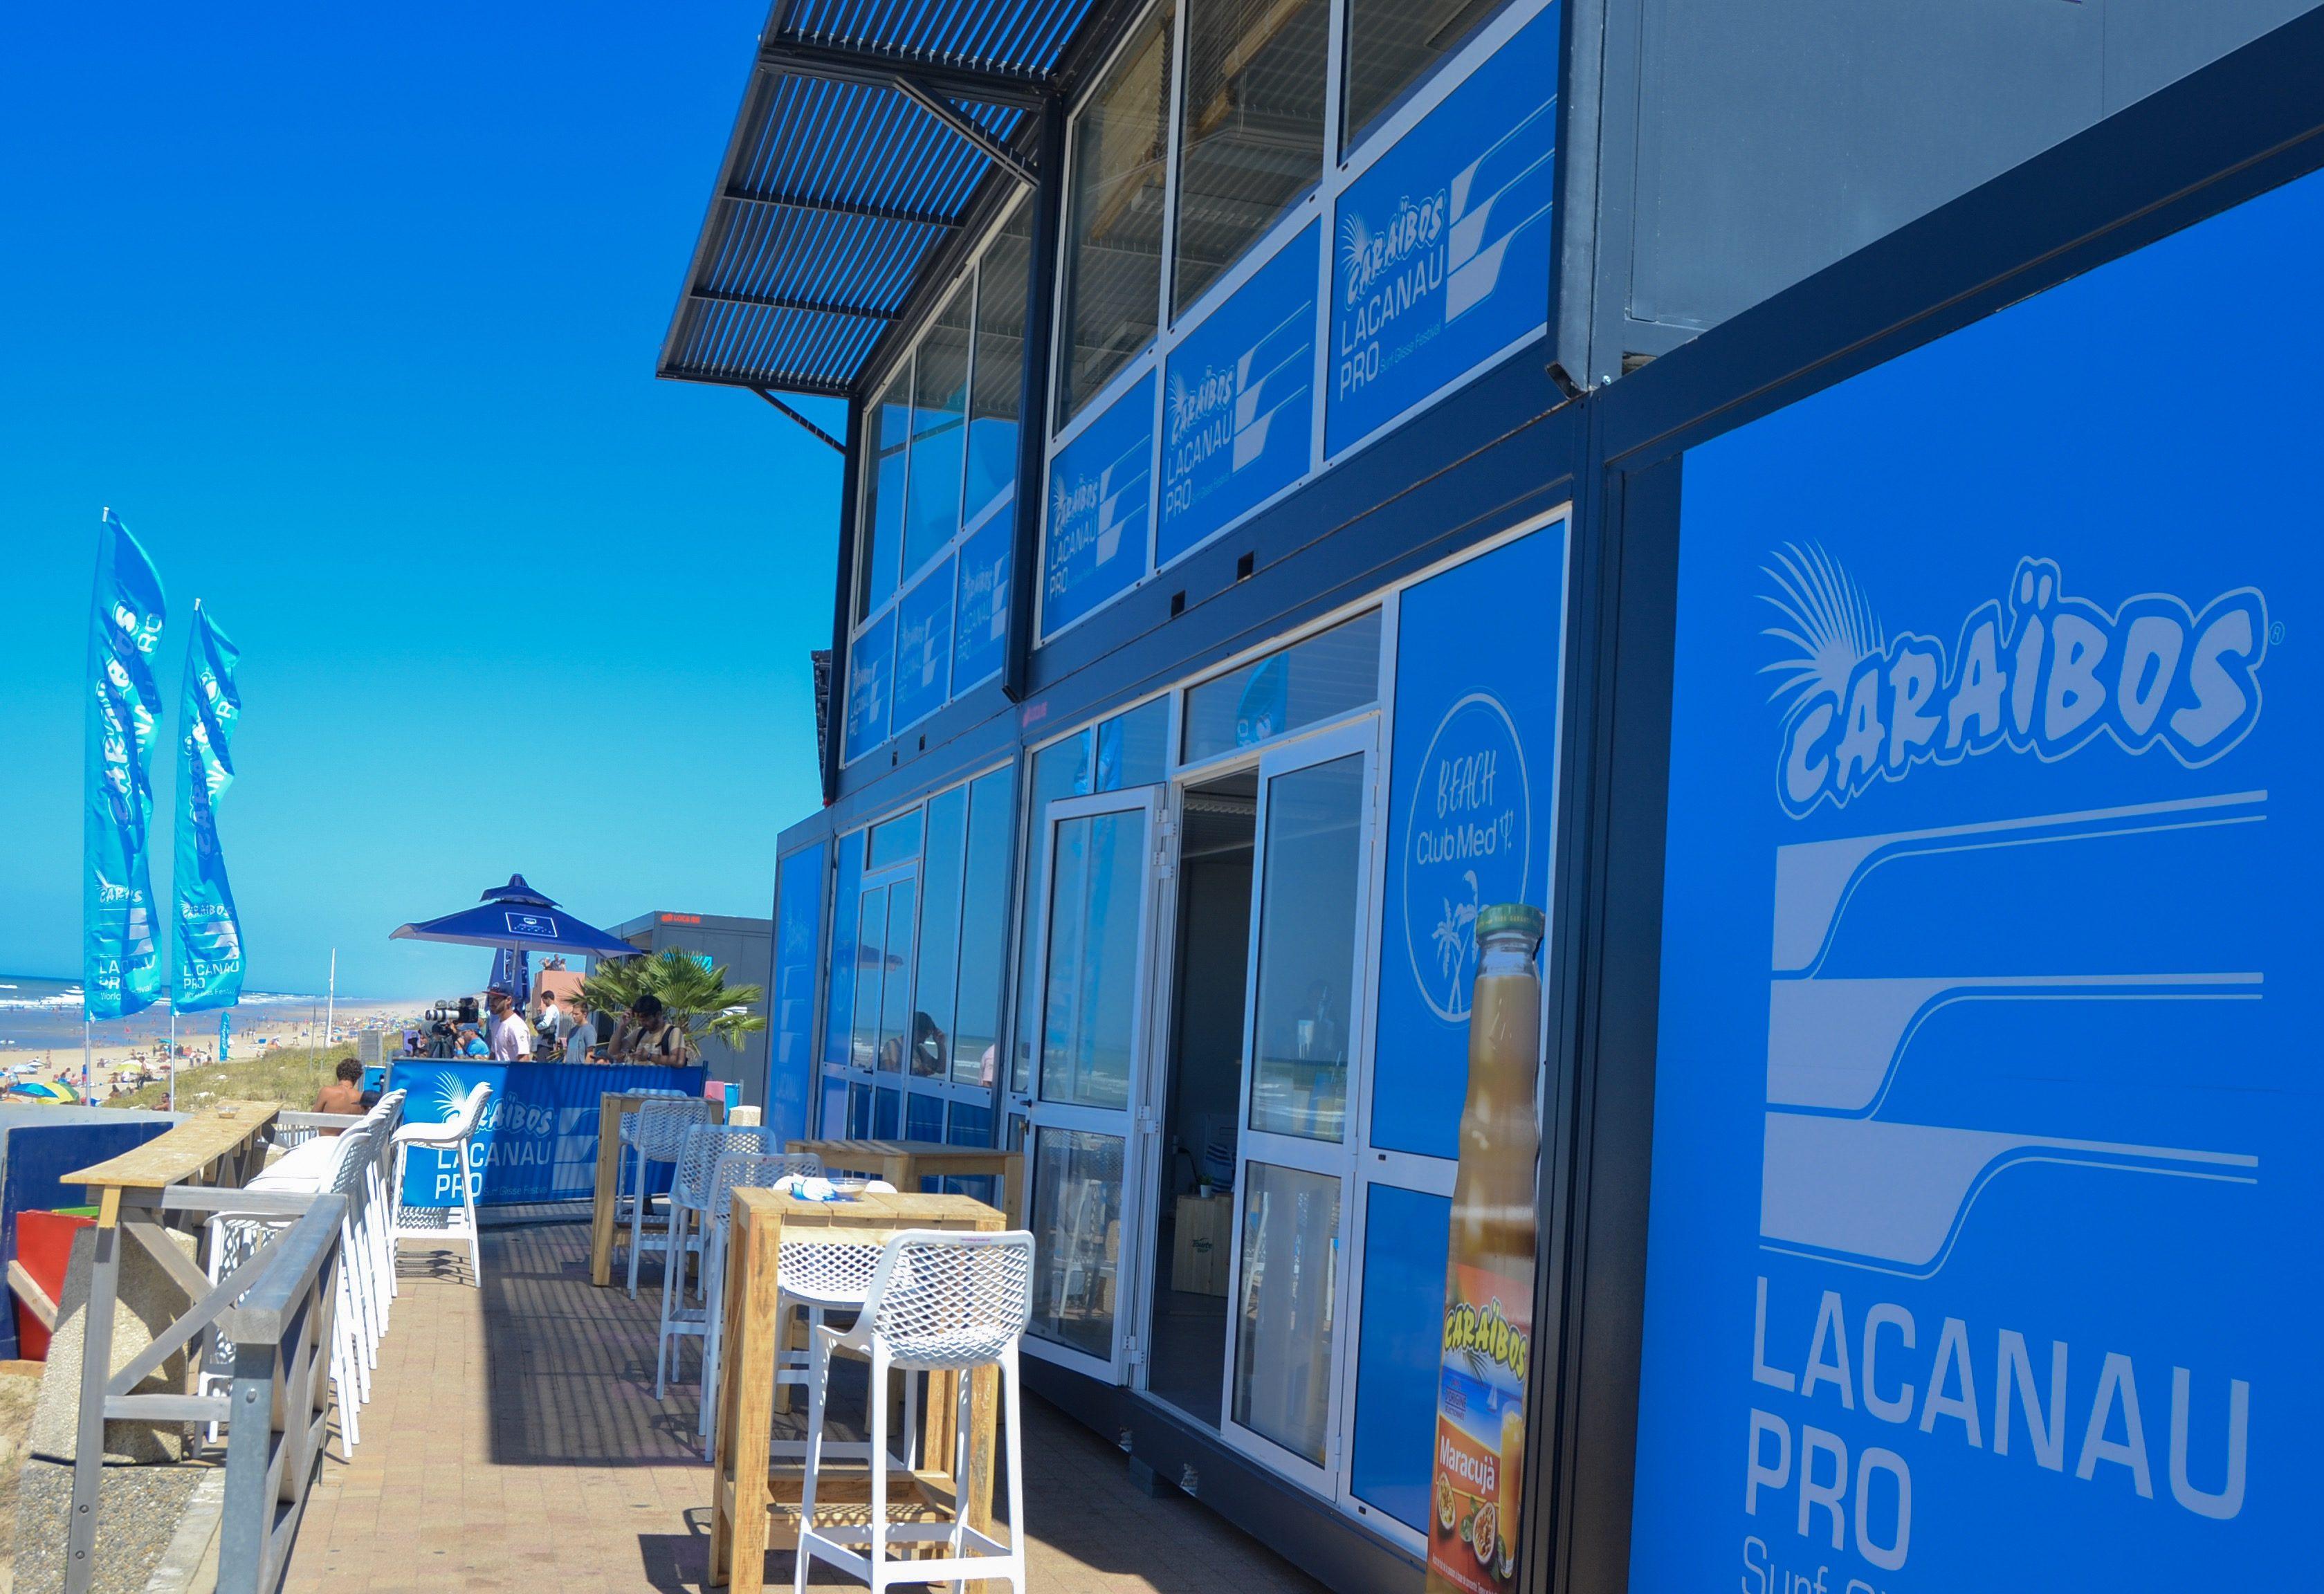 caraibos-lacanau-pro-surf-blog-voyage-les-ptits-touristes-wsl-beach-club-med (2)